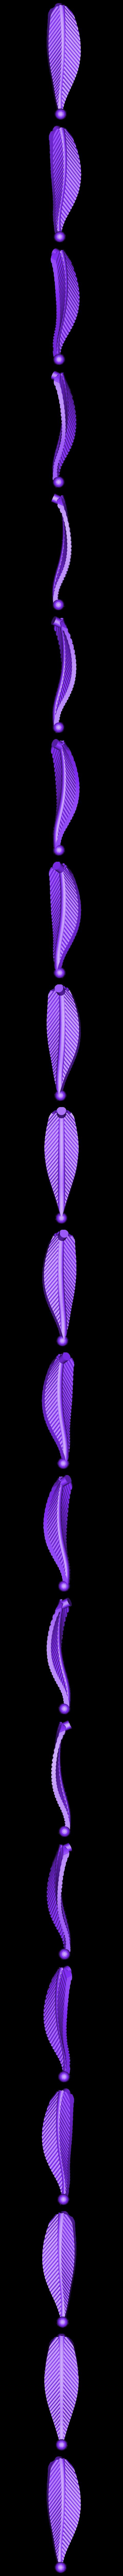 Petal_B.stl Download free STL file Chandelier Iris • 3D printer design, Opossums